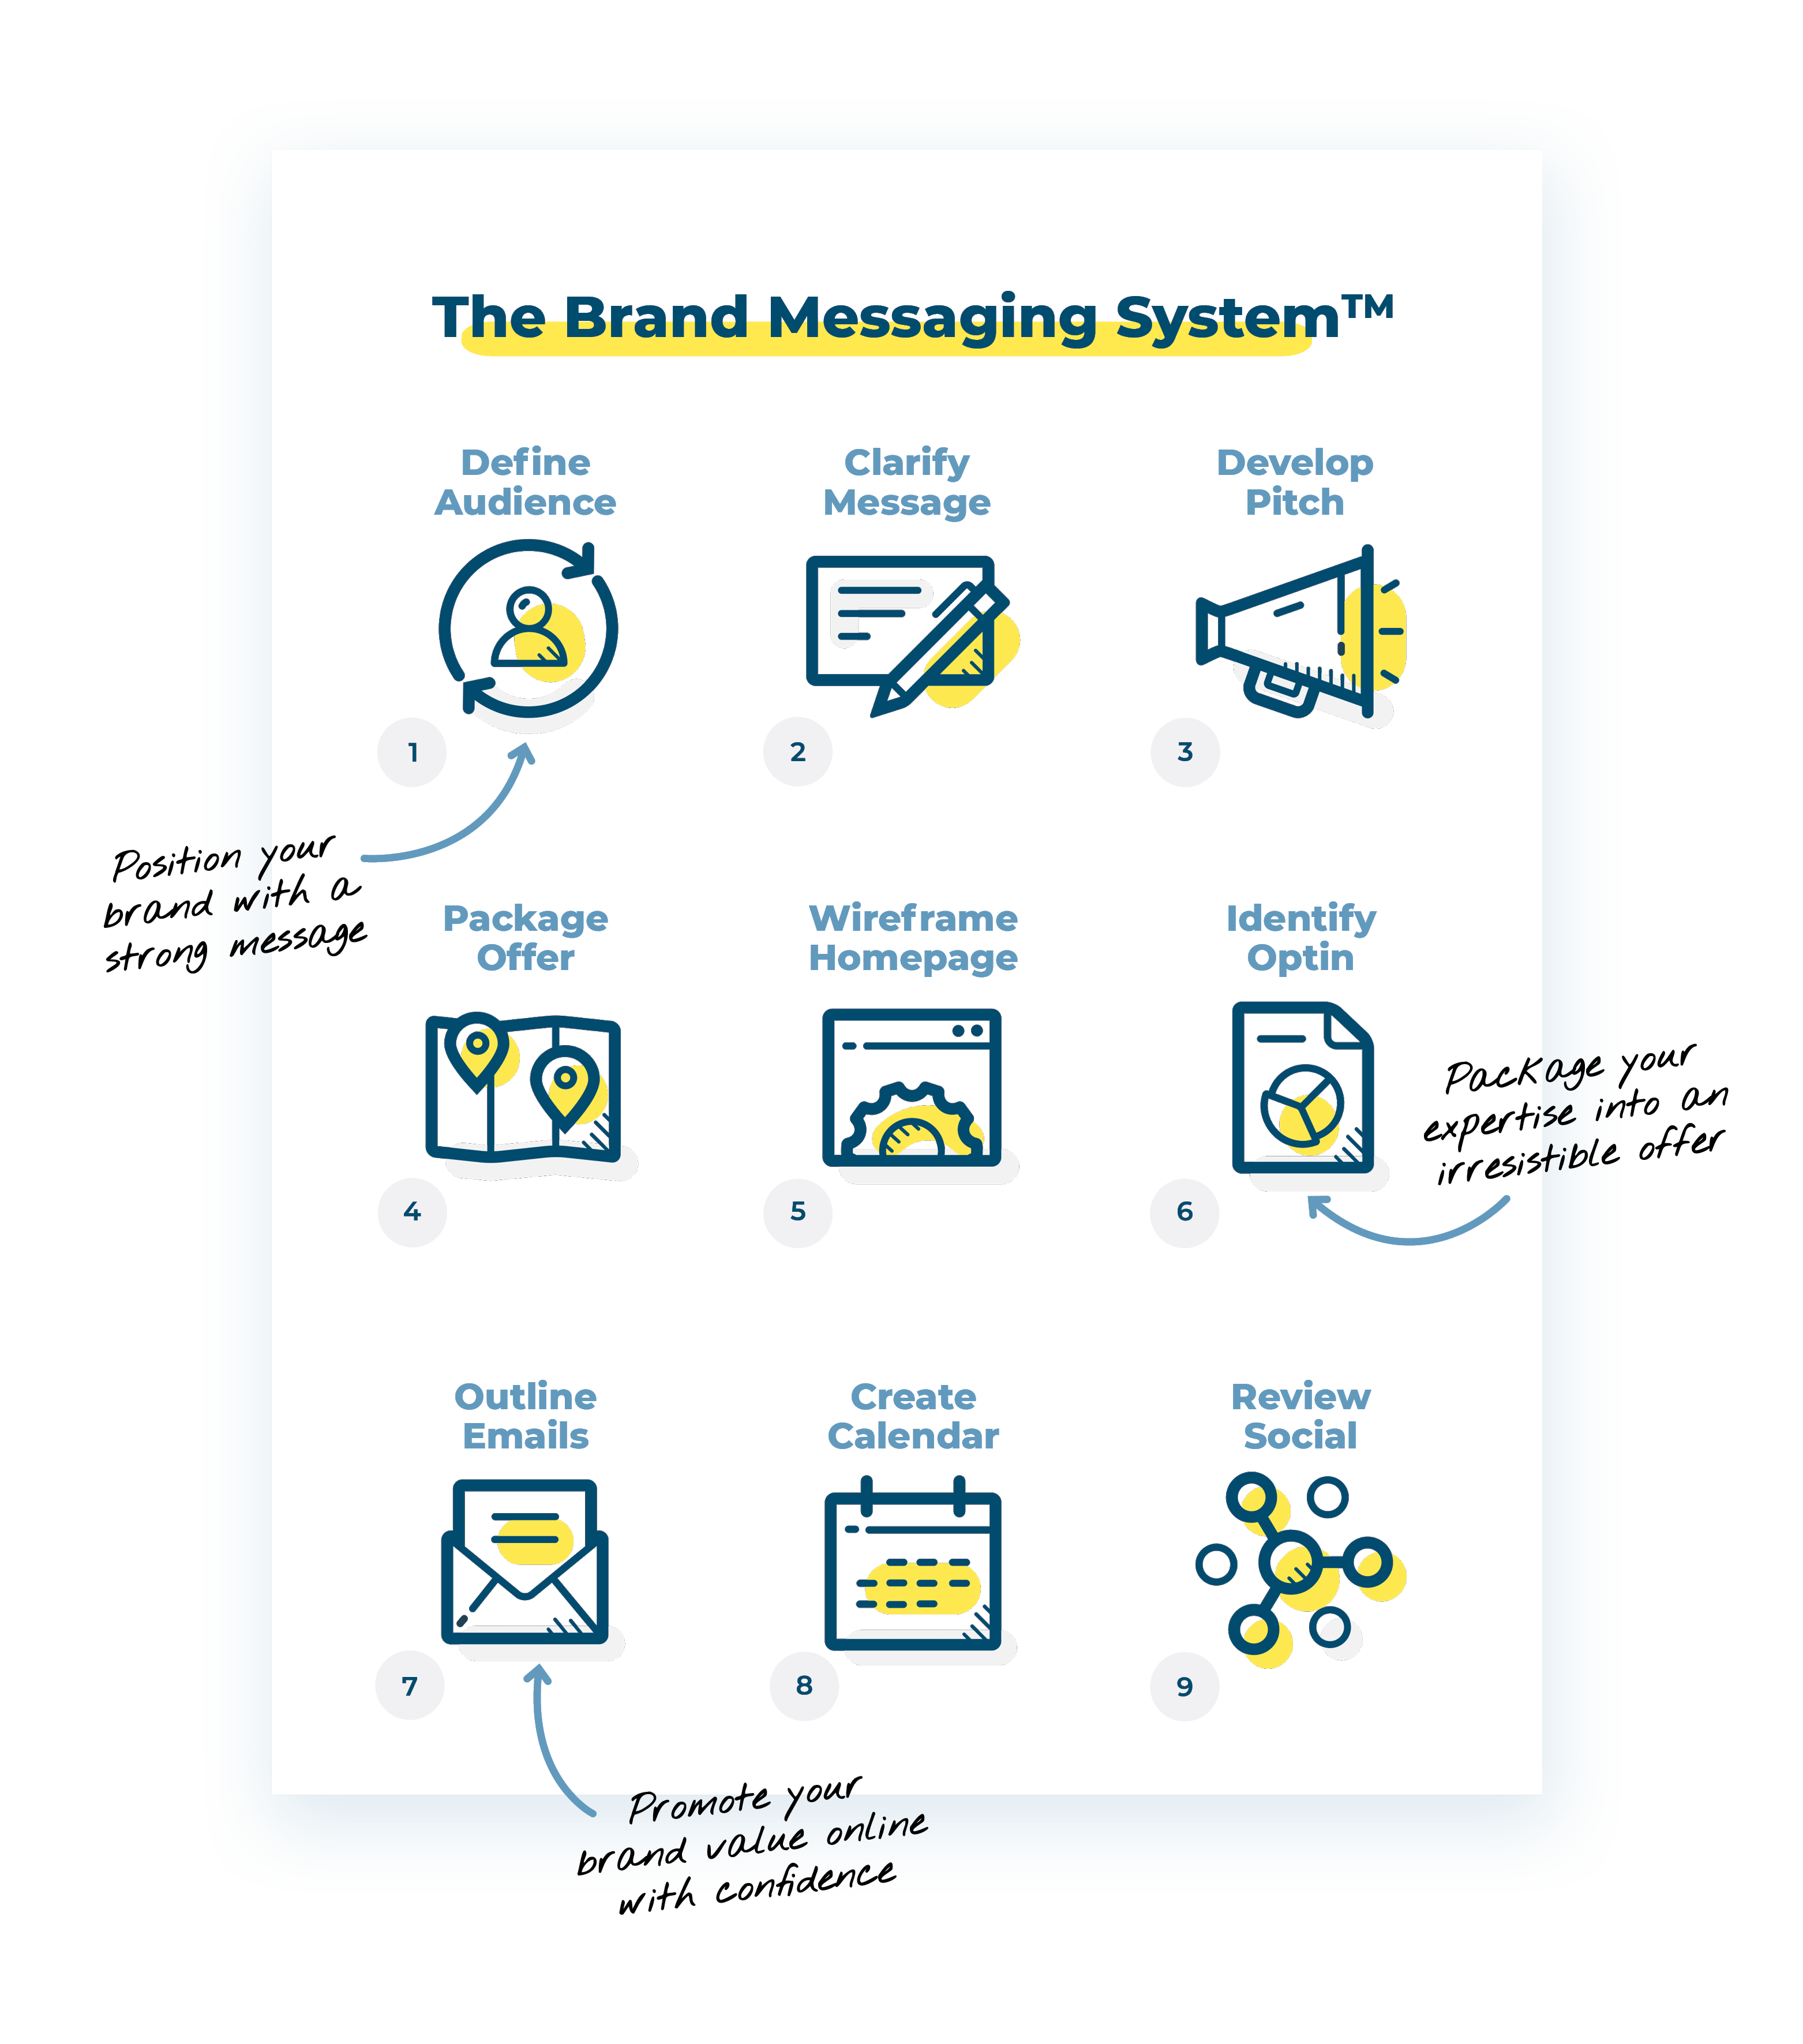 Brand Messaging System v2